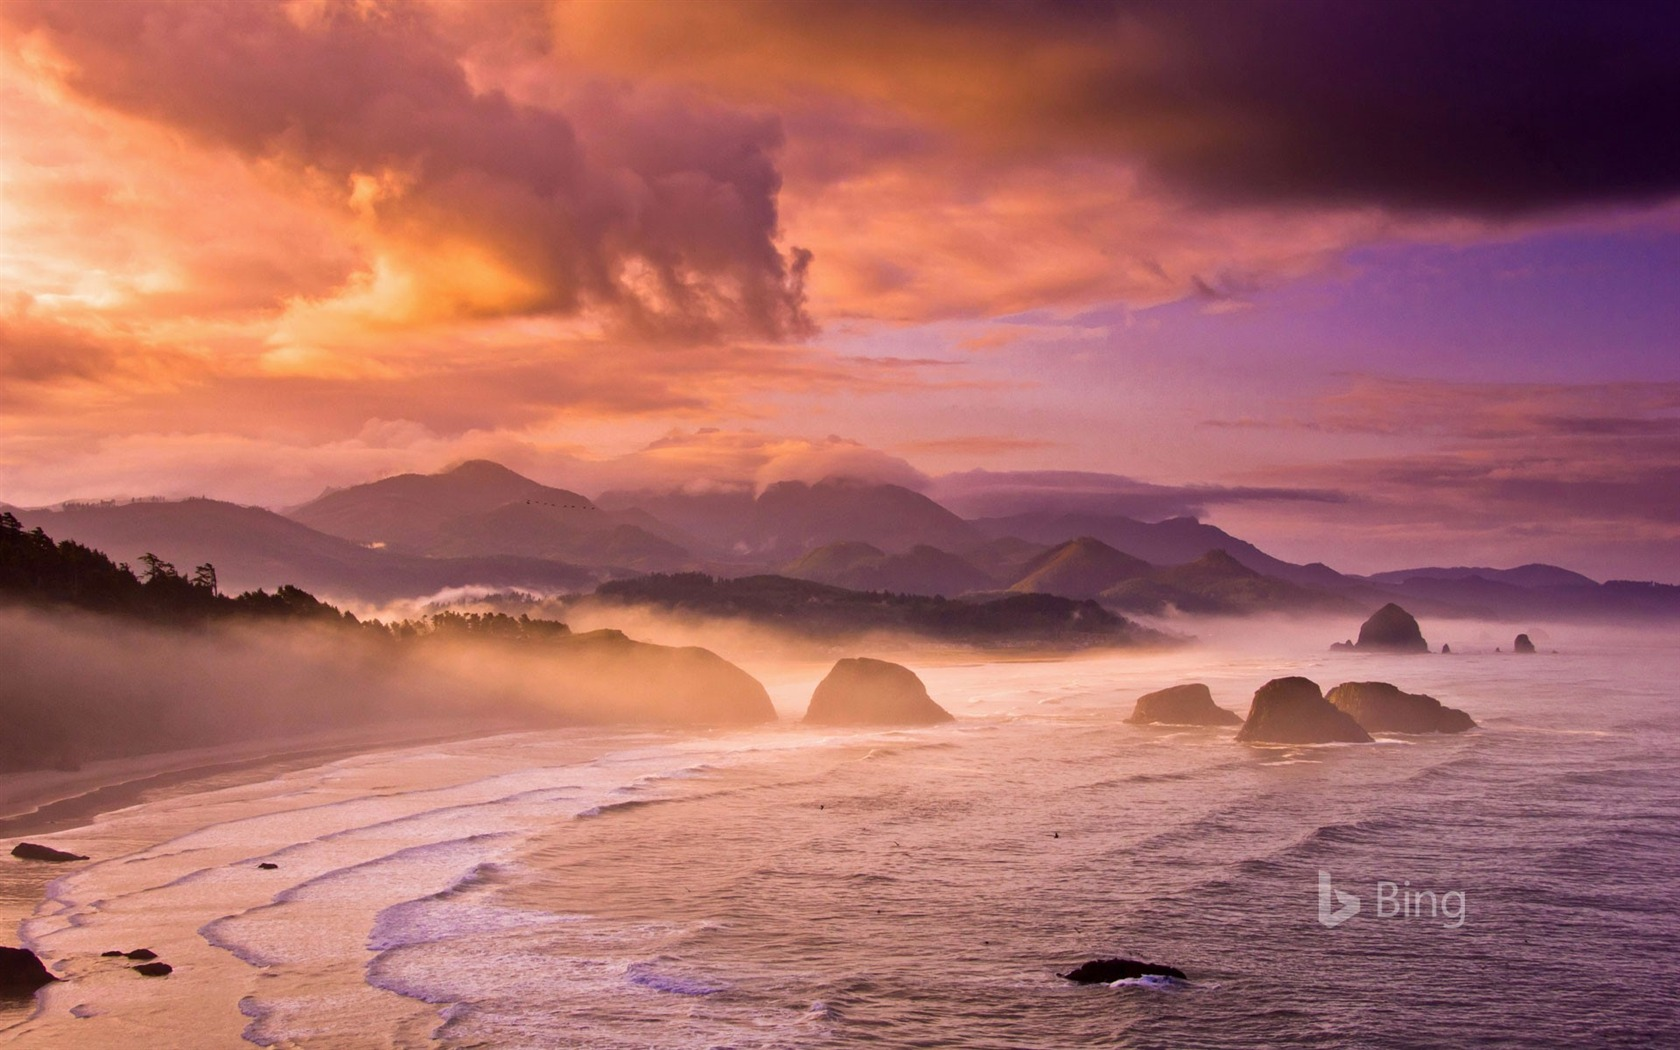 Sunset Beach Oregon State Bing Wallpaper 2018 Preview